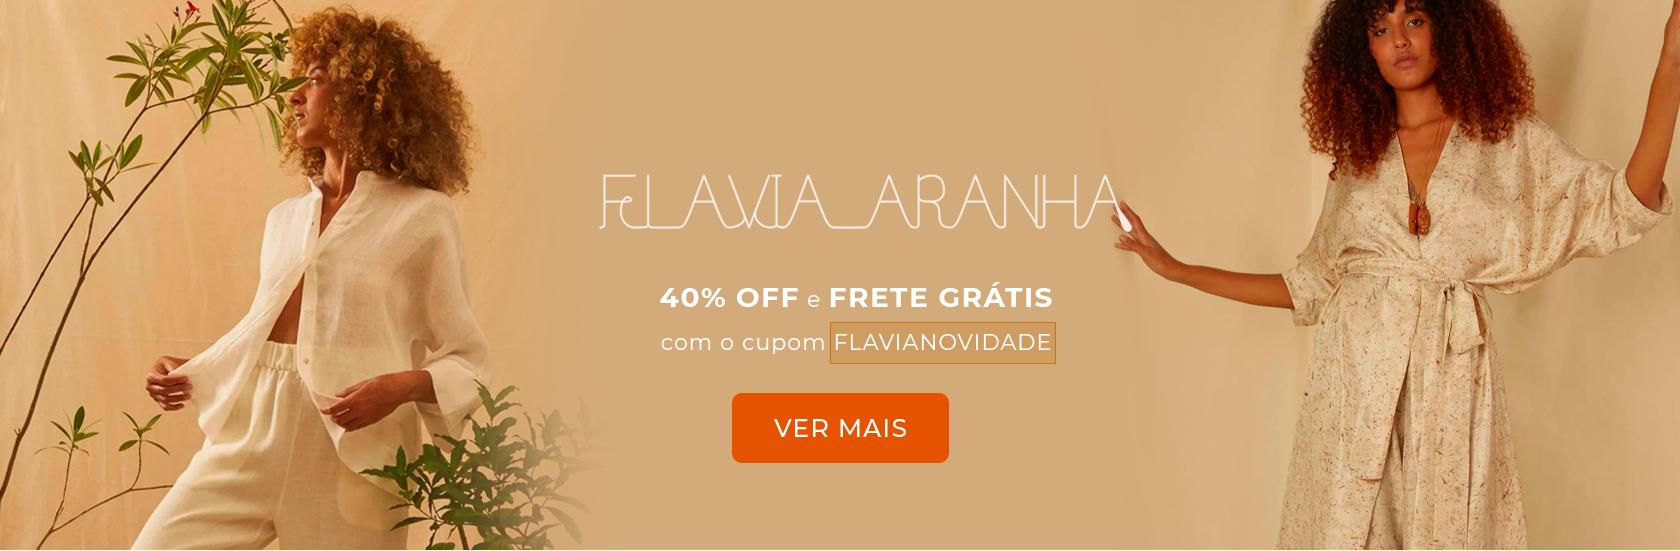 Banner 3 - FLAVIA ARANHA